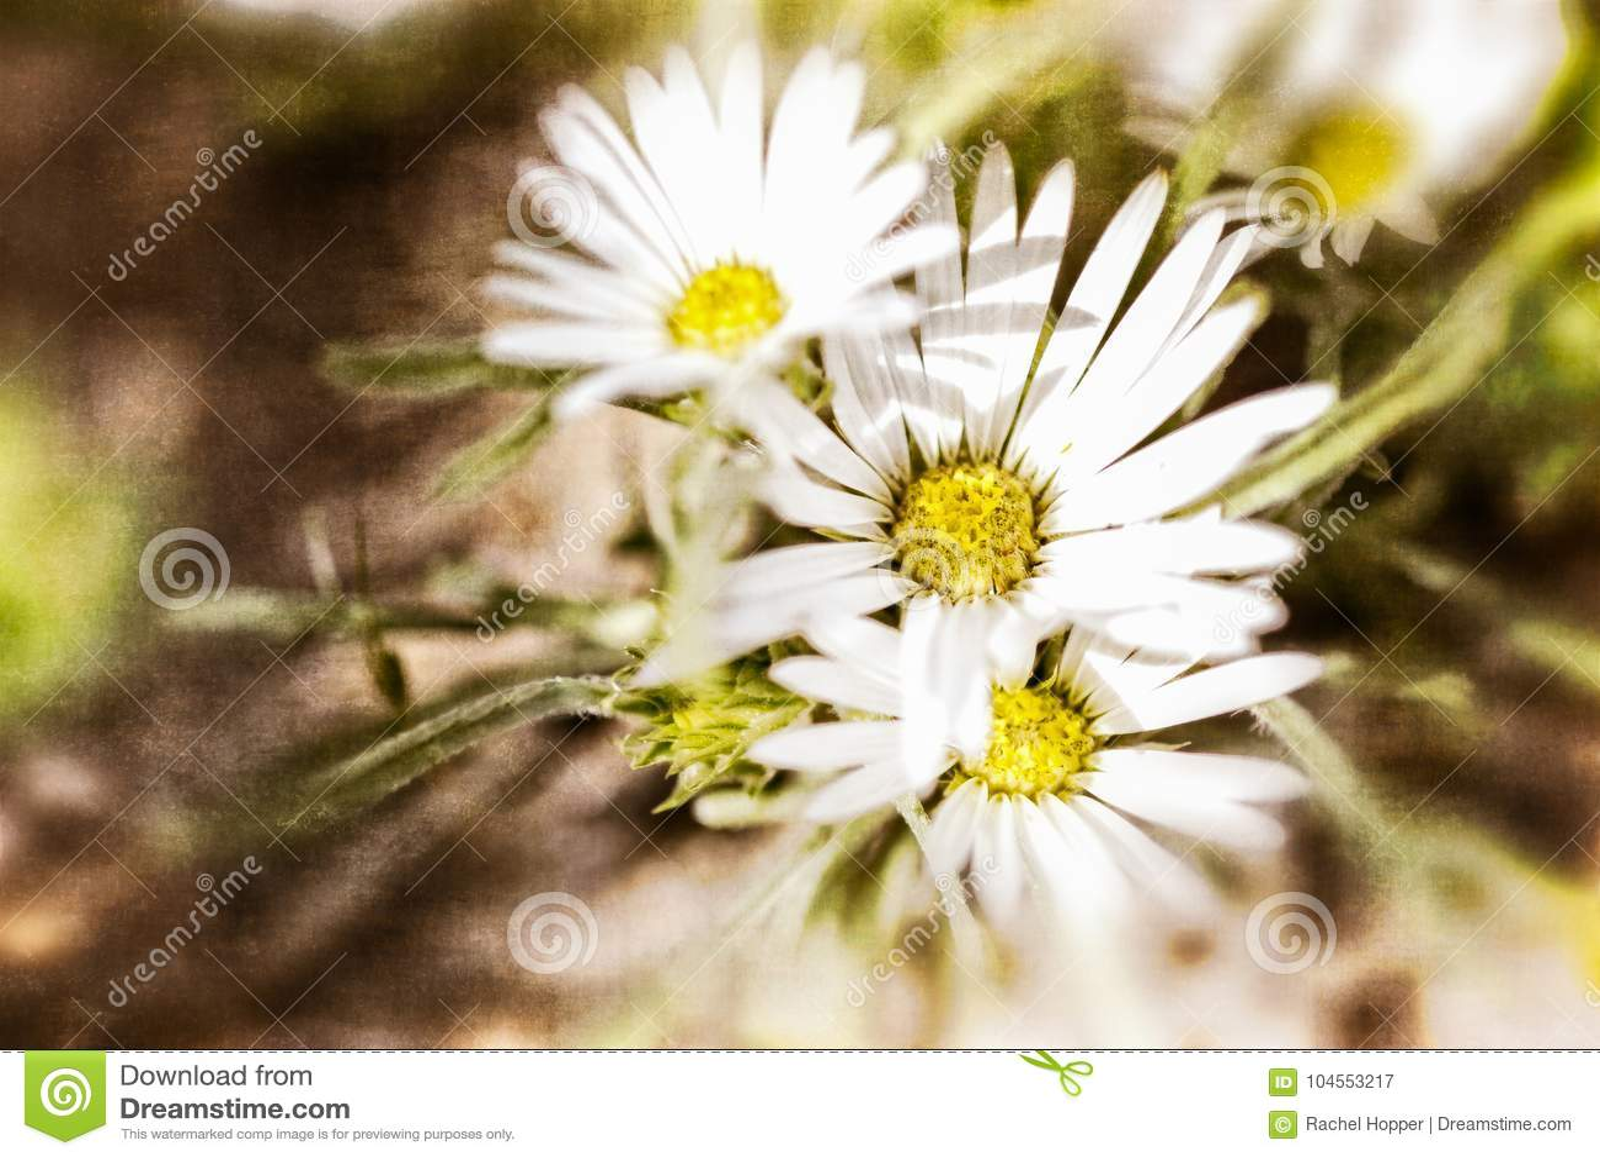 Textured White Daisy Background